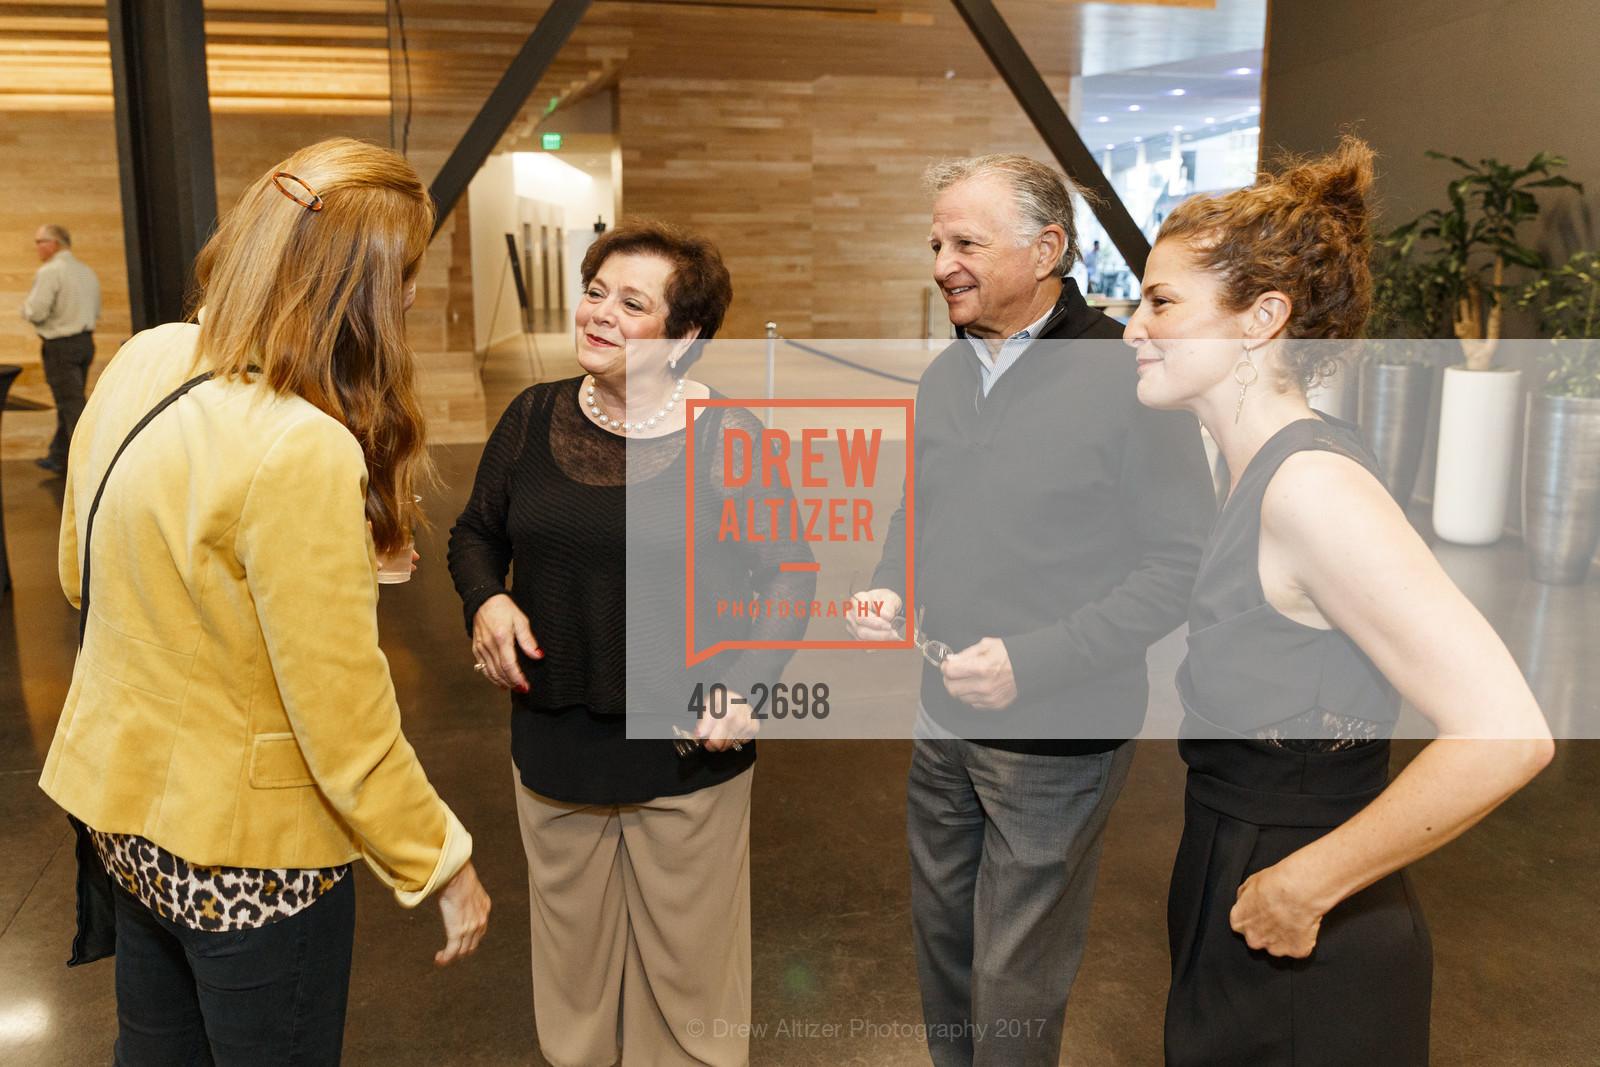 Kyle Redford, Sharon Rosenblum, Jeff Rosenblum, Jill Tidman, Photo #40-2698